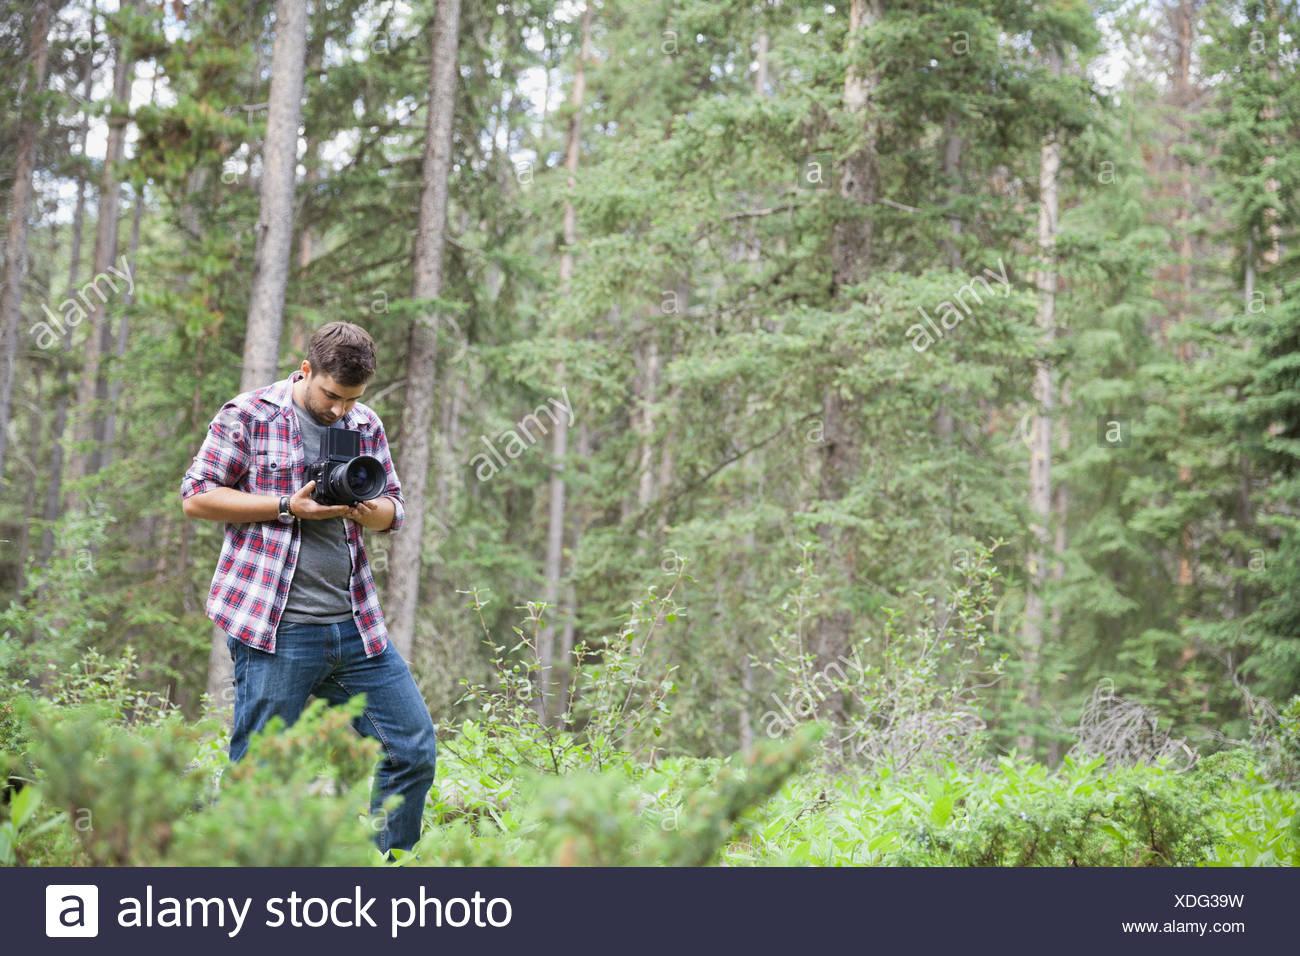 Fotógrafo macho usando una cámara SLR afuera Imagen De Stock